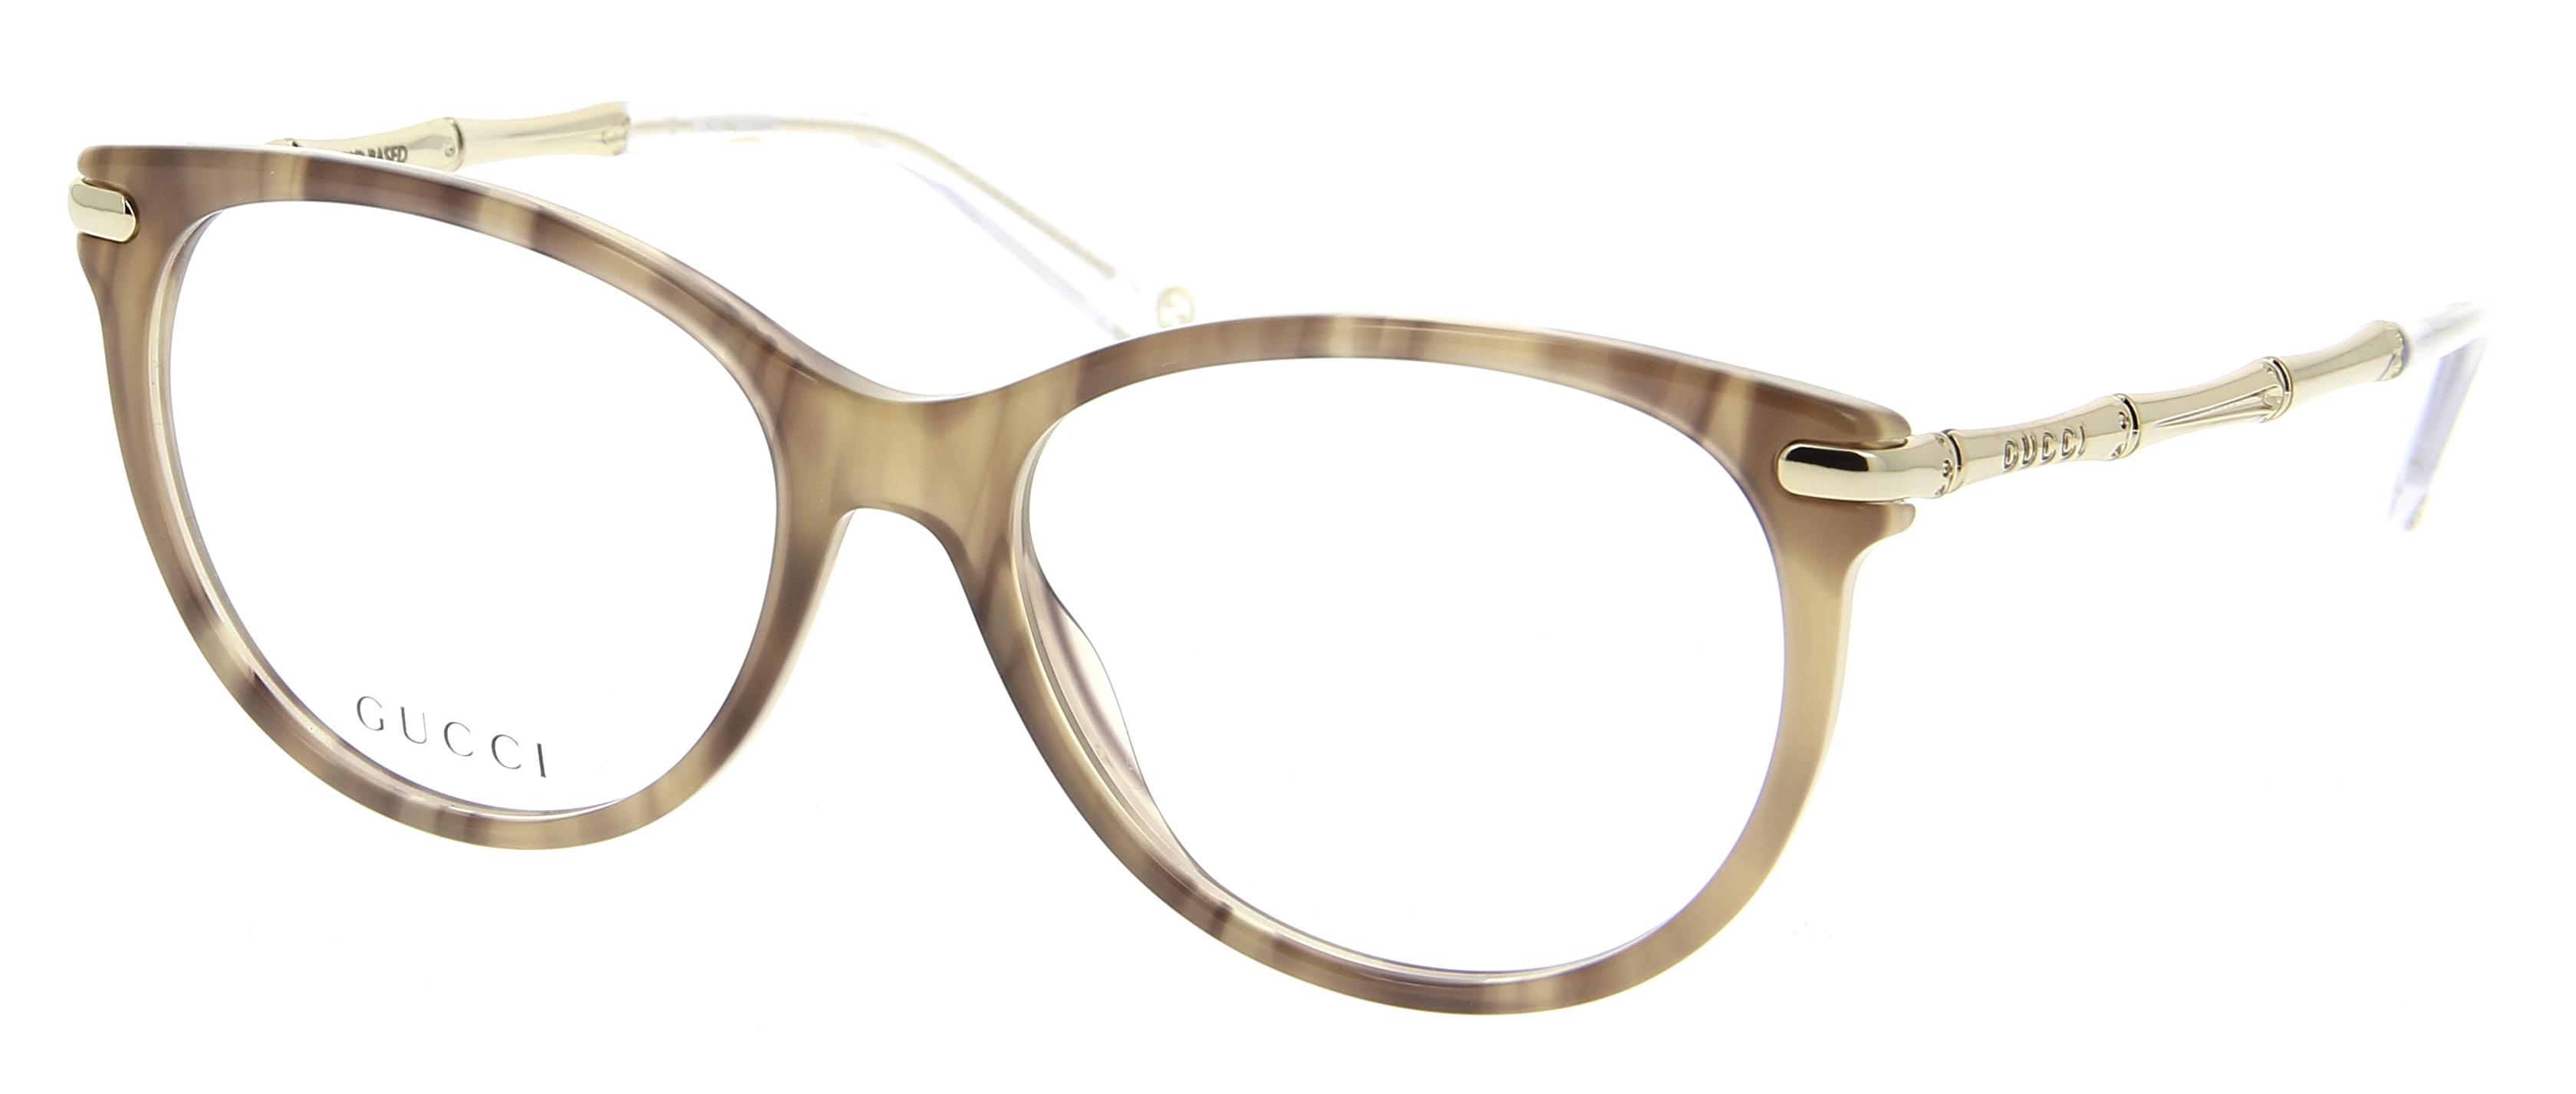 lunettes de vue gucci bamboo. Black Bedroom Furniture Sets. Home Design Ideas